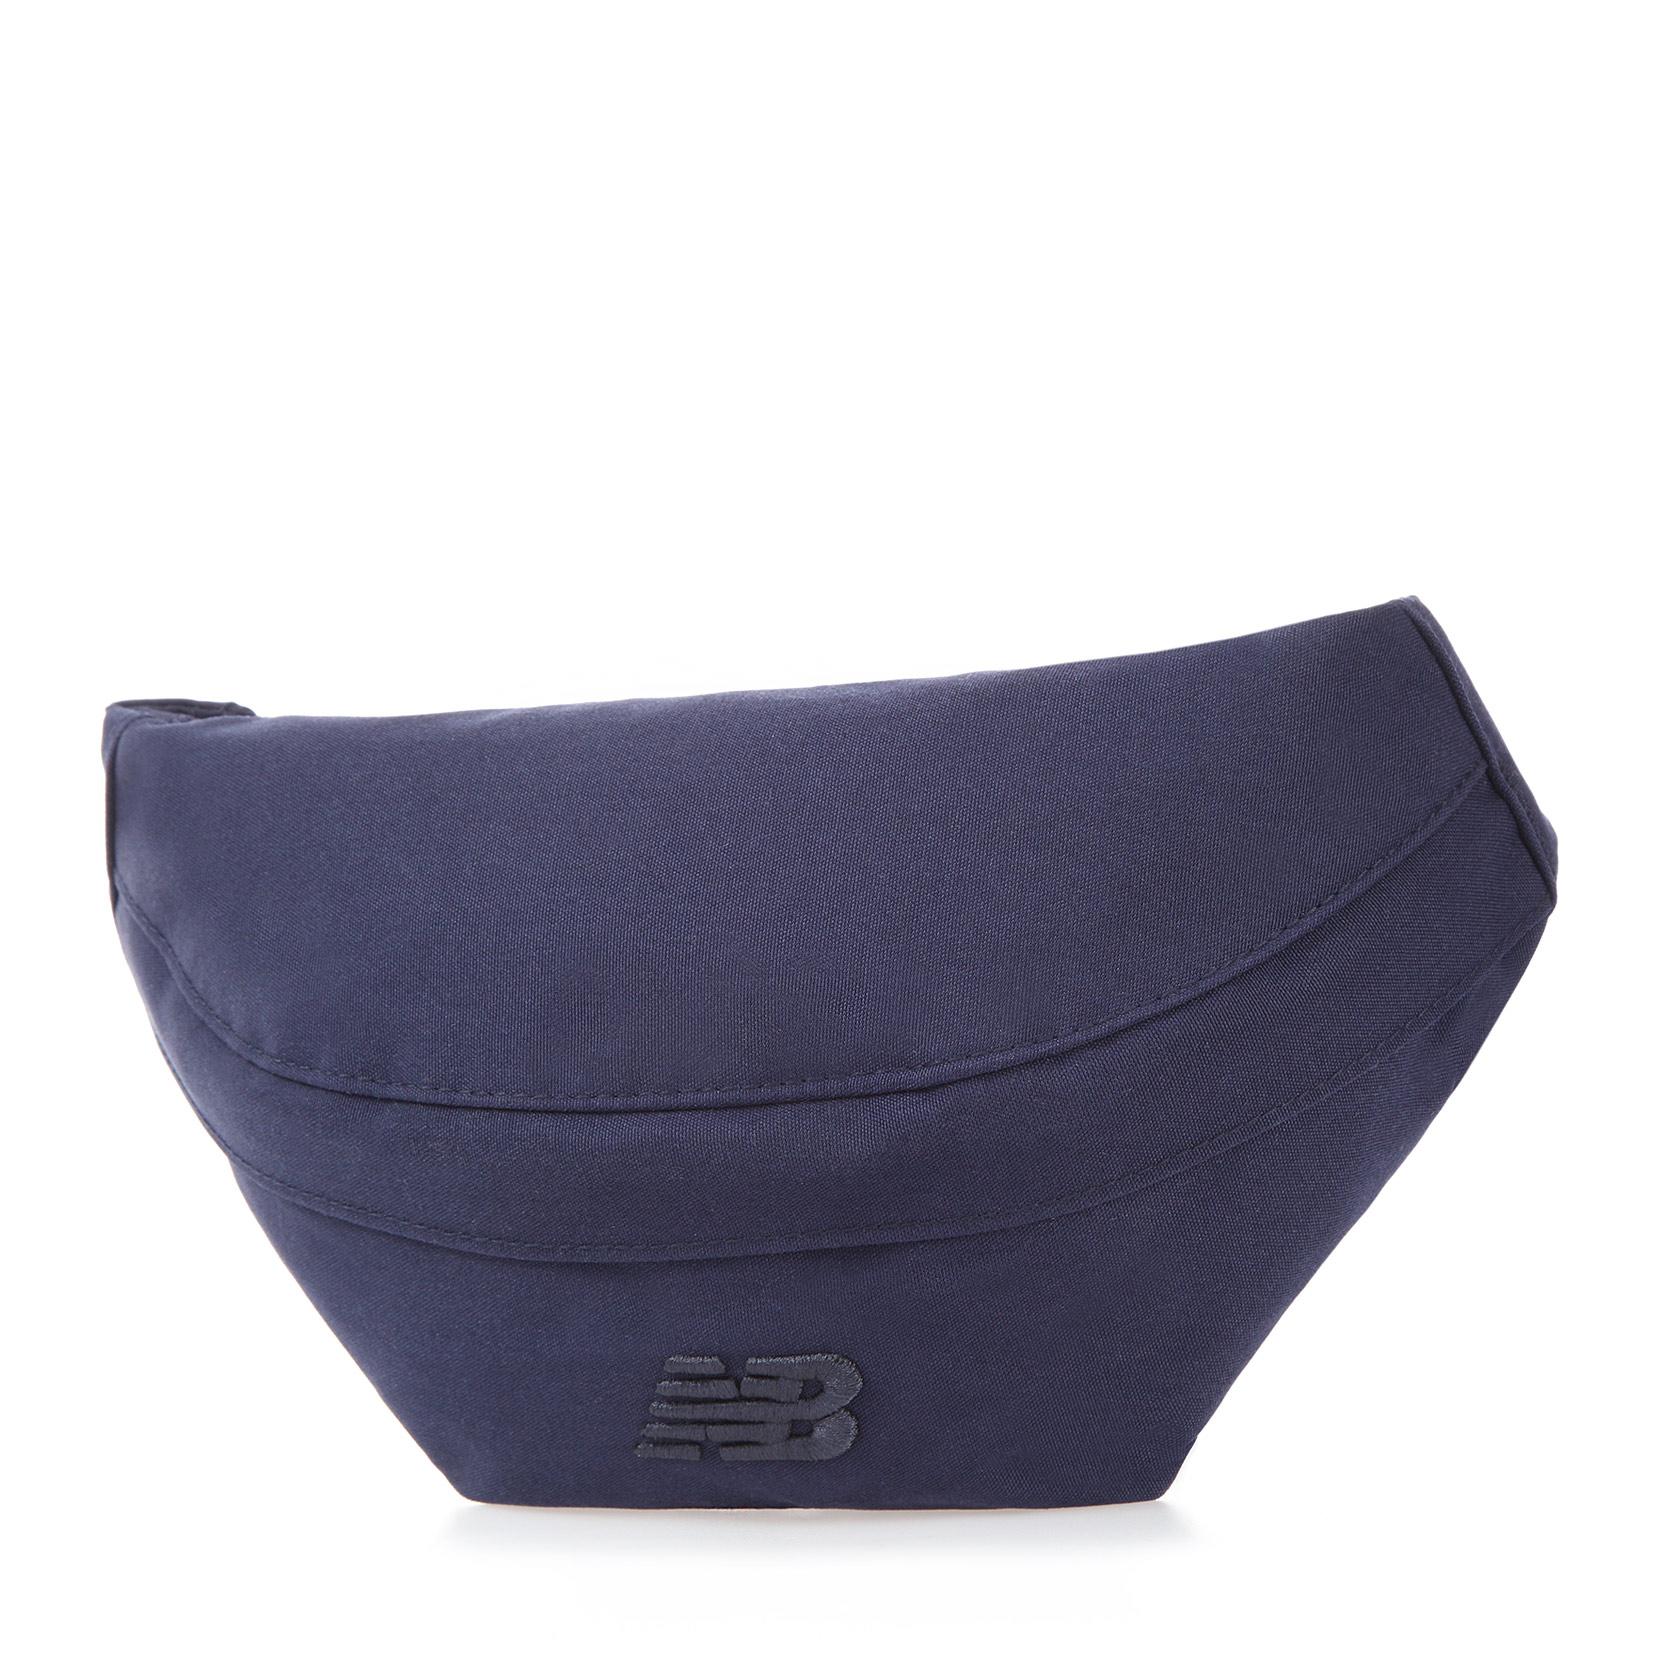 99796a5e4547 Поясна сумка Waist Pack 500279-420   New Balance